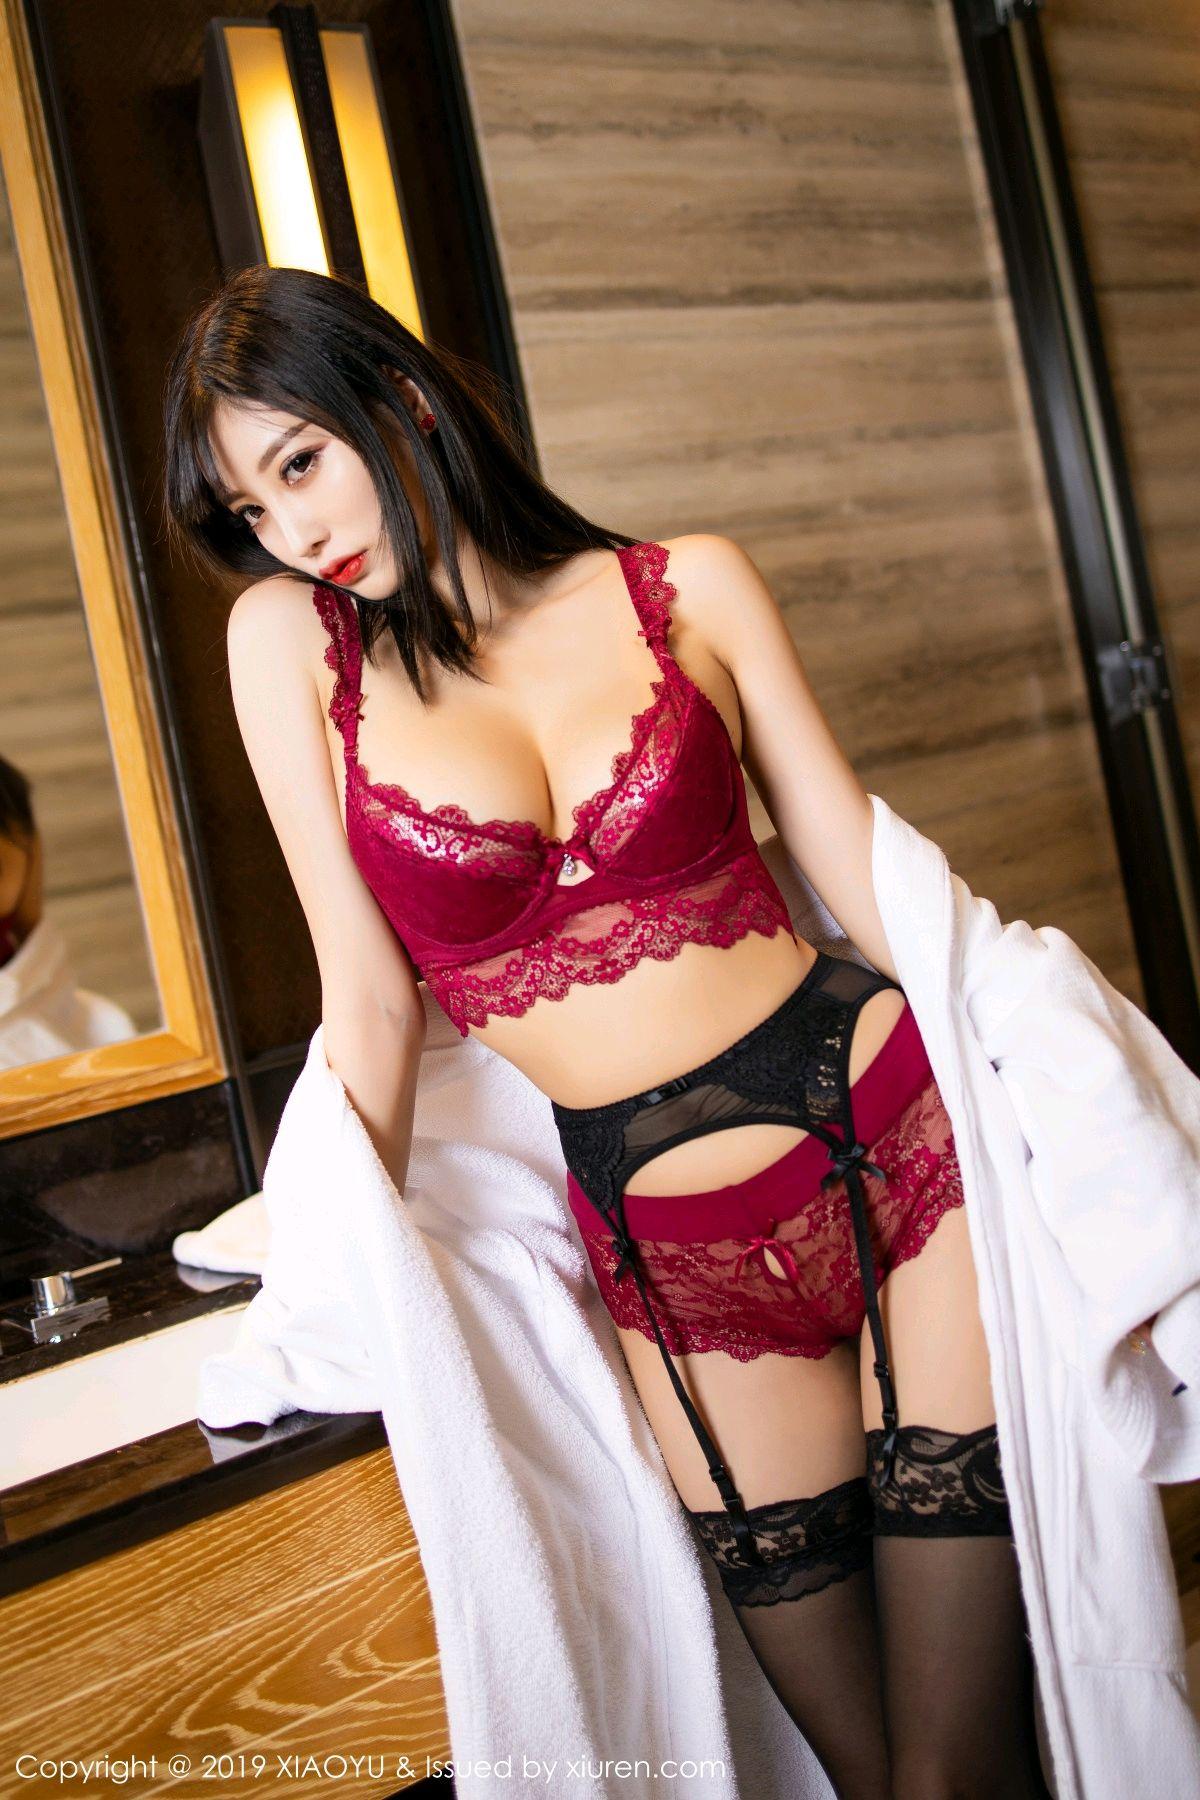 [XiaoYu] Vol.153 Yang Chen Chen 32P, Bathroom, Black Silk, Underwear, XiaoYu, Yang Chen Chen